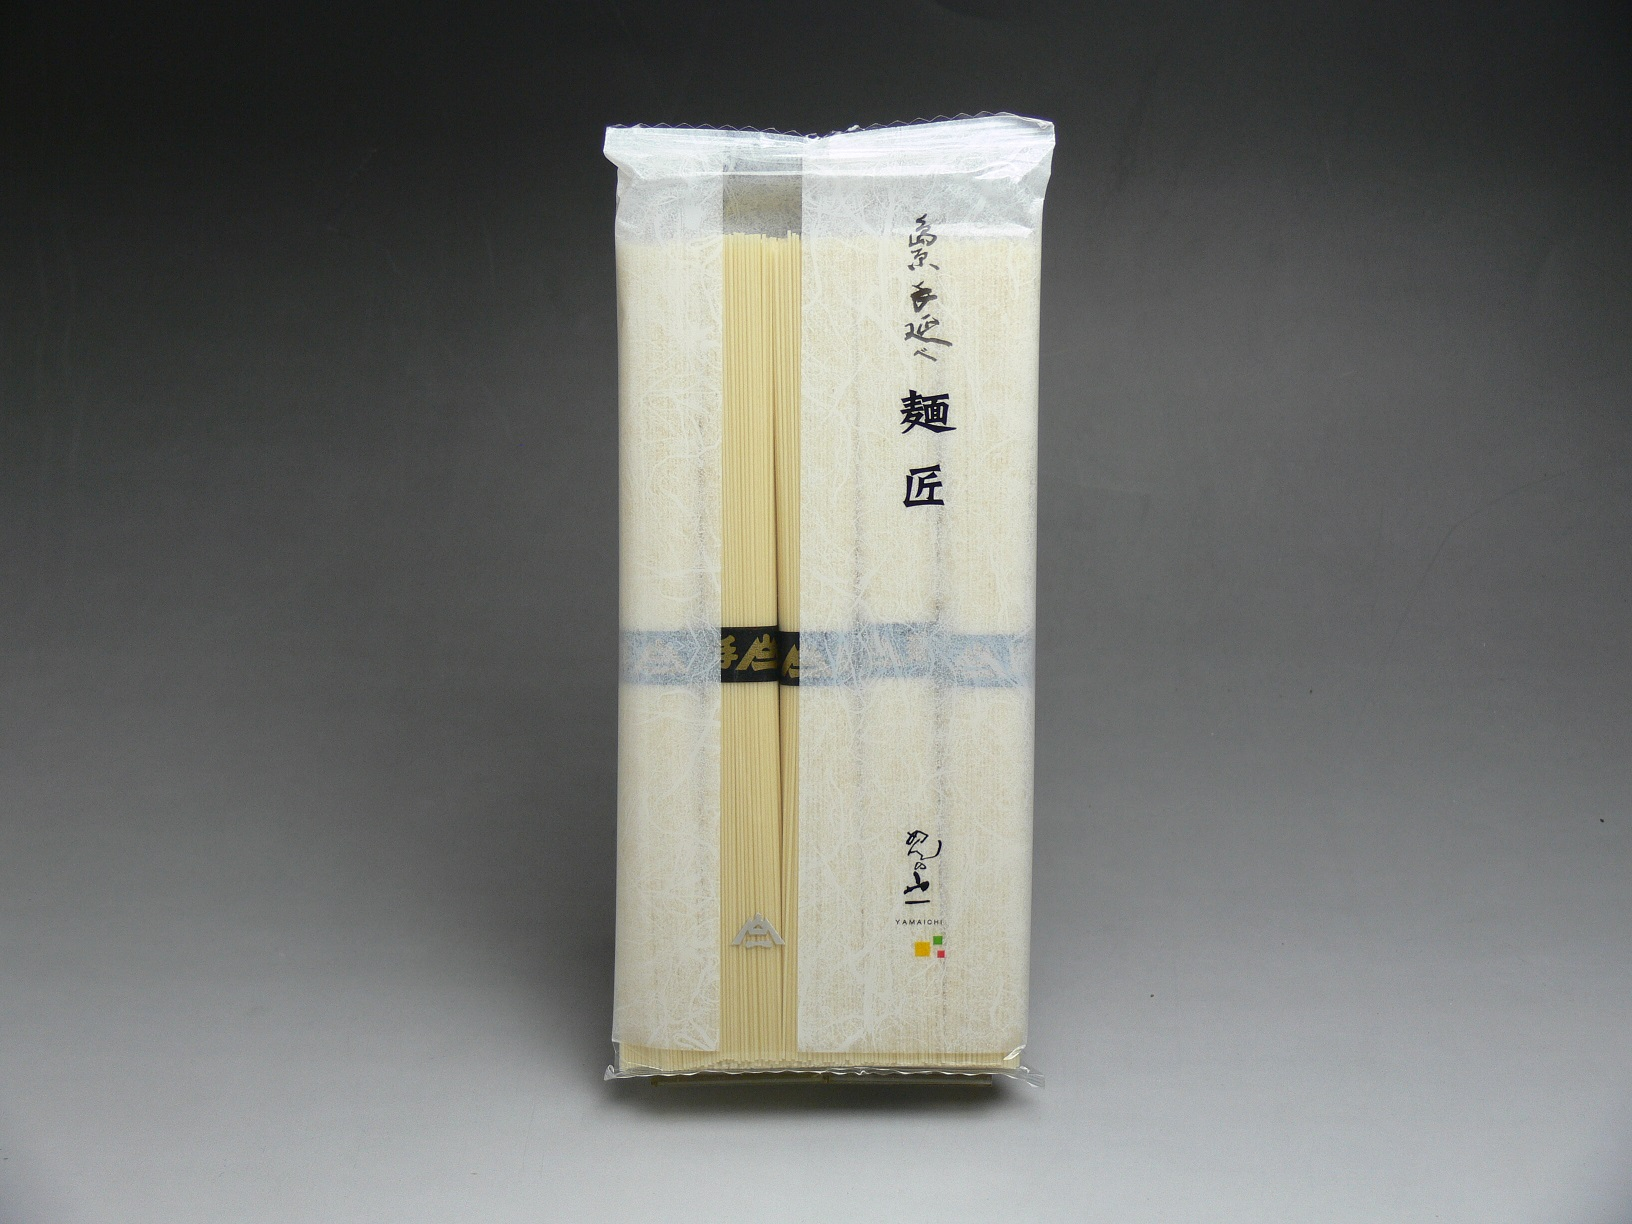 【MBN-05】 手延べそうめん 5束袋入